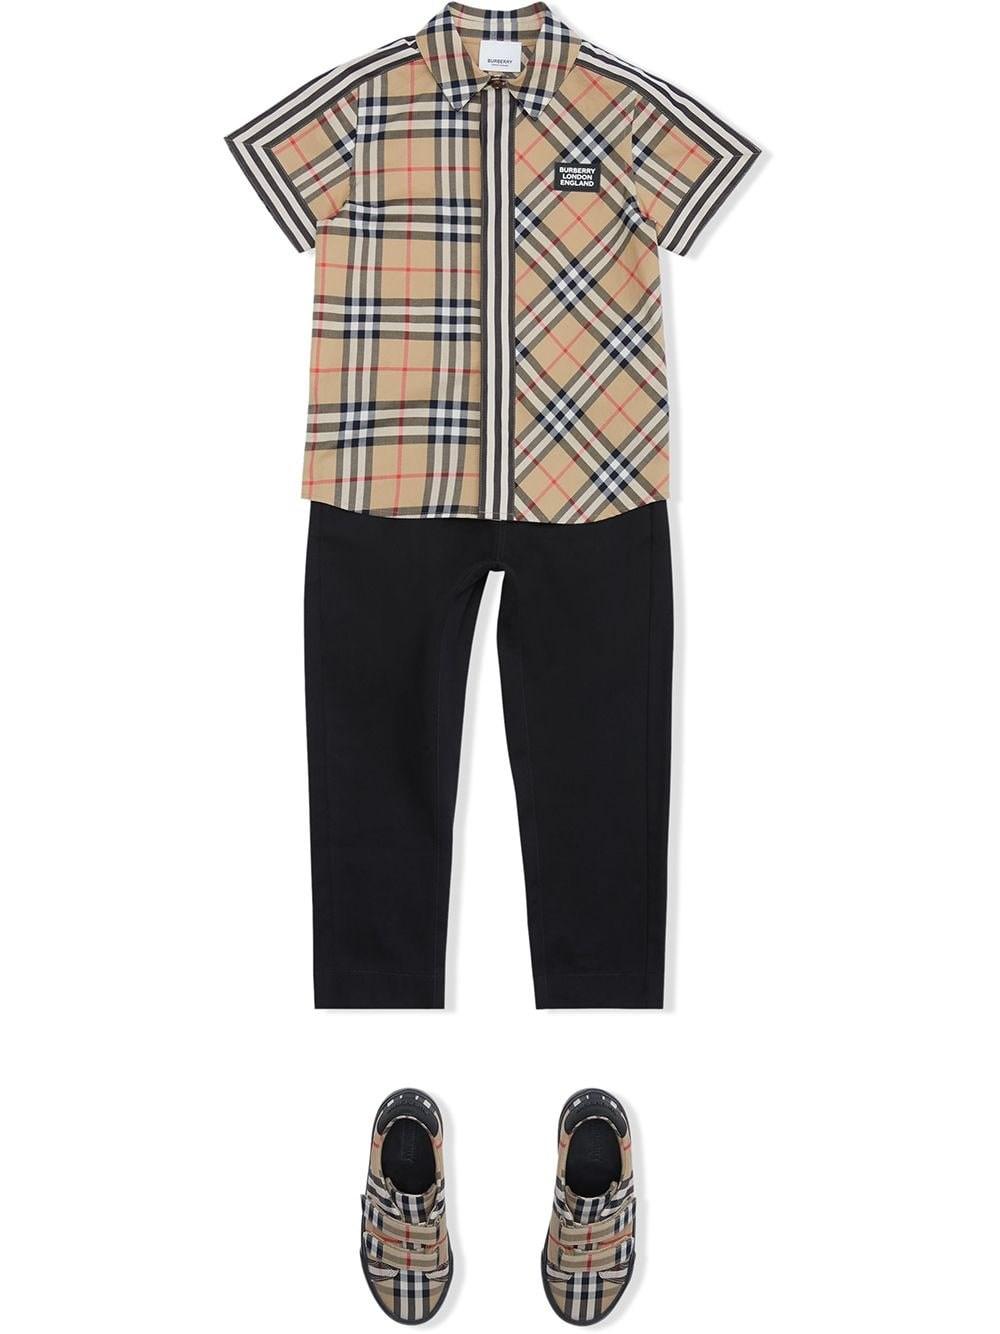 Burberry Boys' Barrett Vintage Check Shirt - Little Kid, Big Kid In Archive Beige